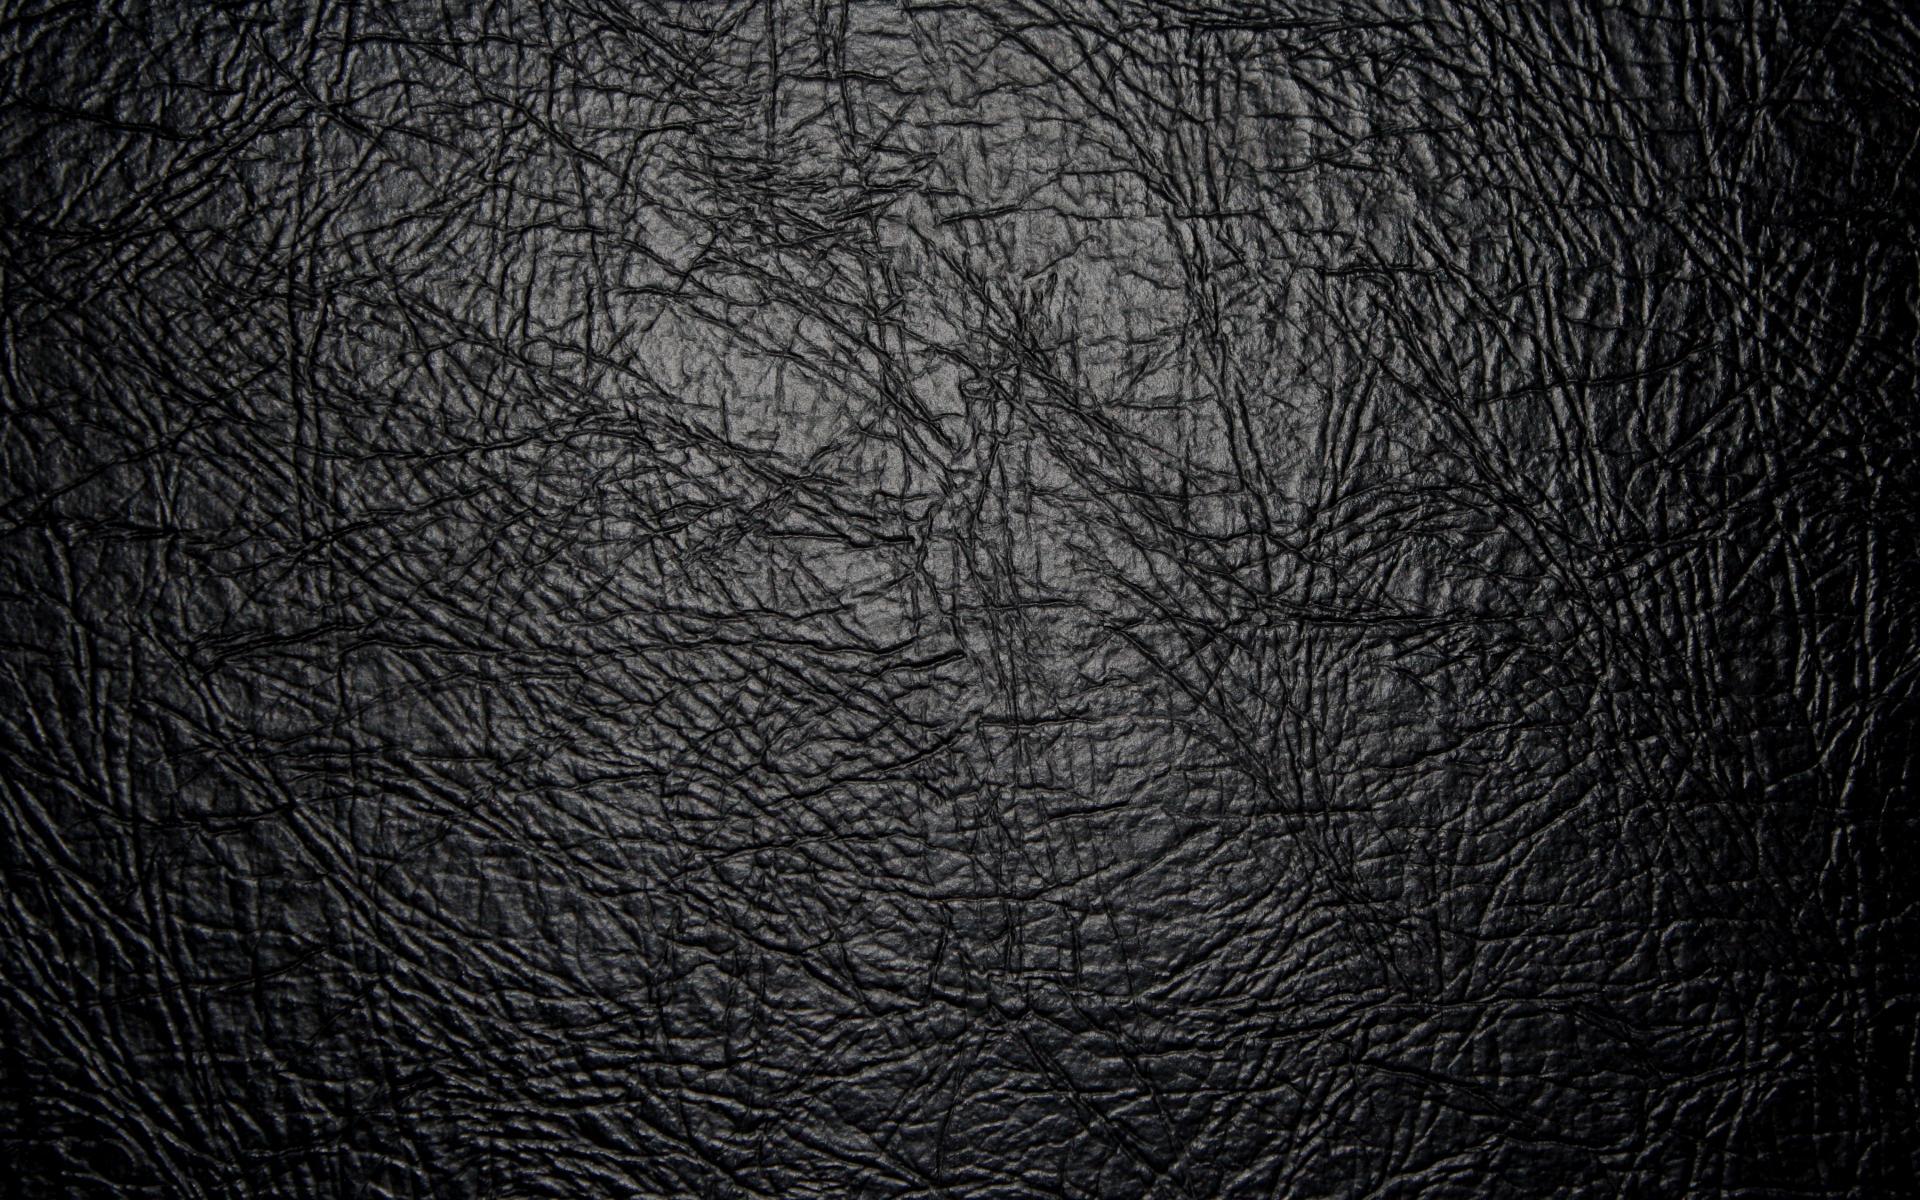 grey sofa fabric texture eco linen sectional sleeper black leather backgrounds free download | pixelstalk.net